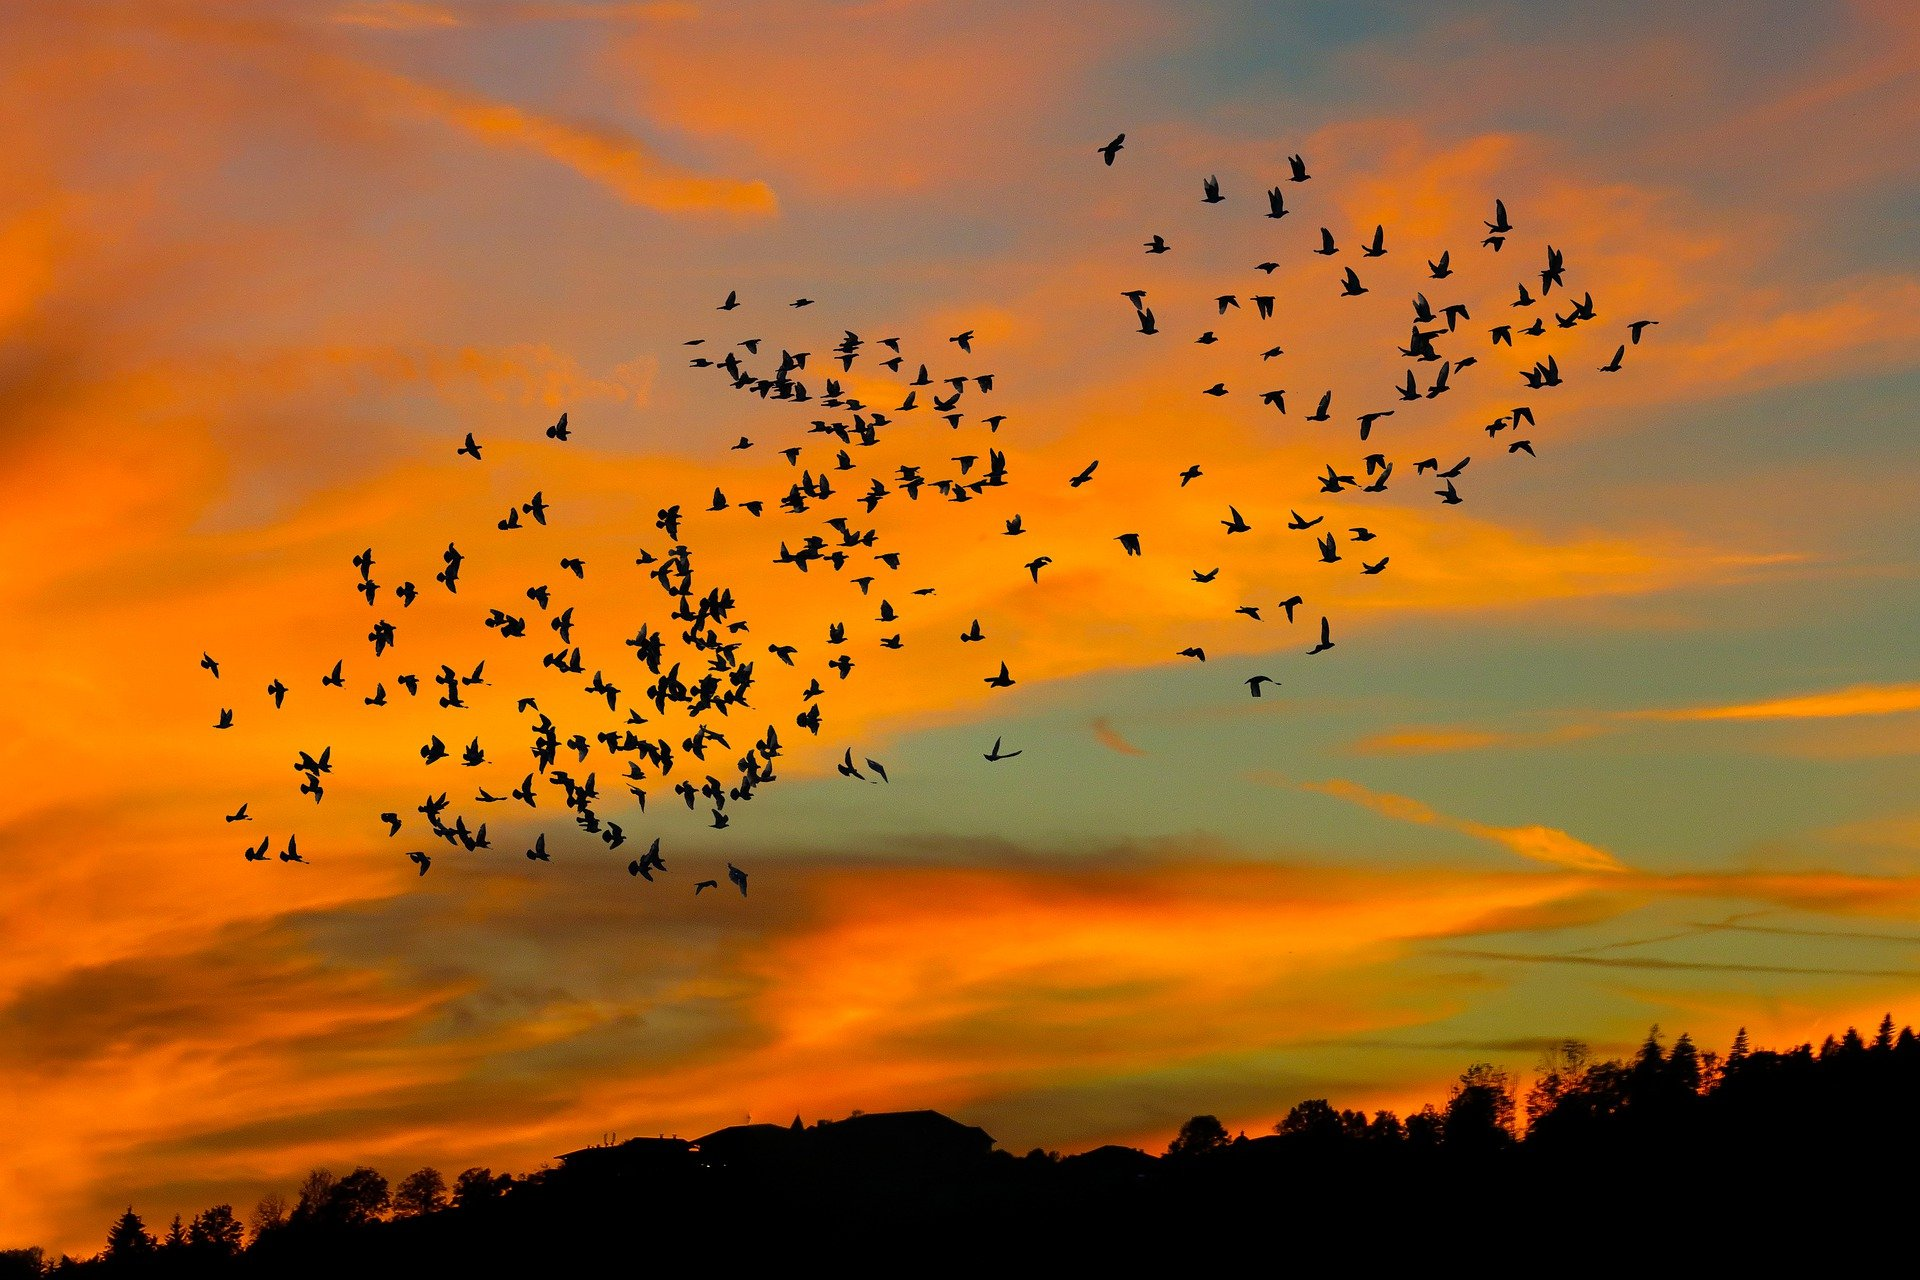 Autumn walks migrating birds